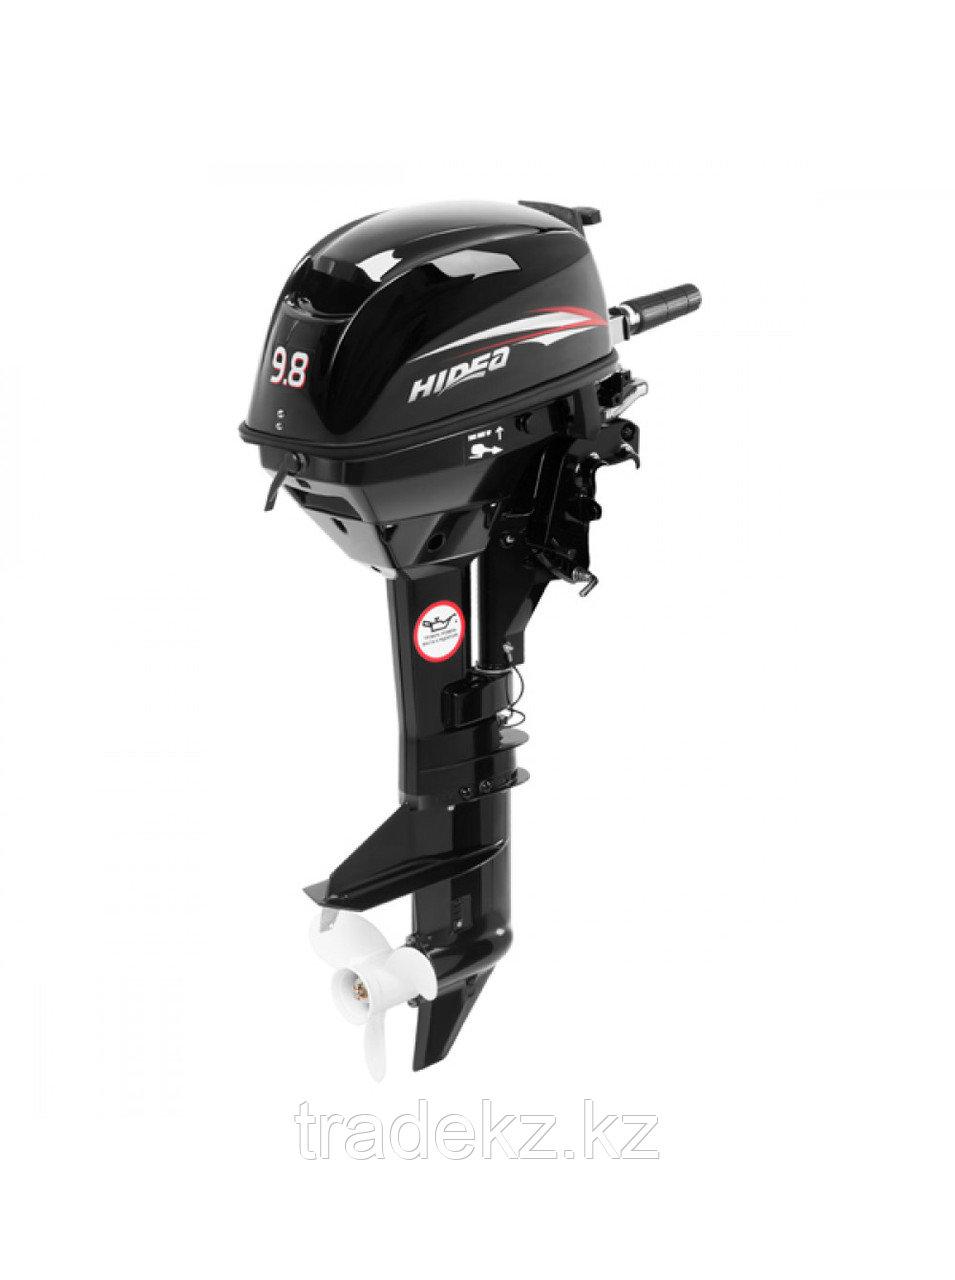 Двухтактный лодочный мотор HIDEA HD9.8FHS